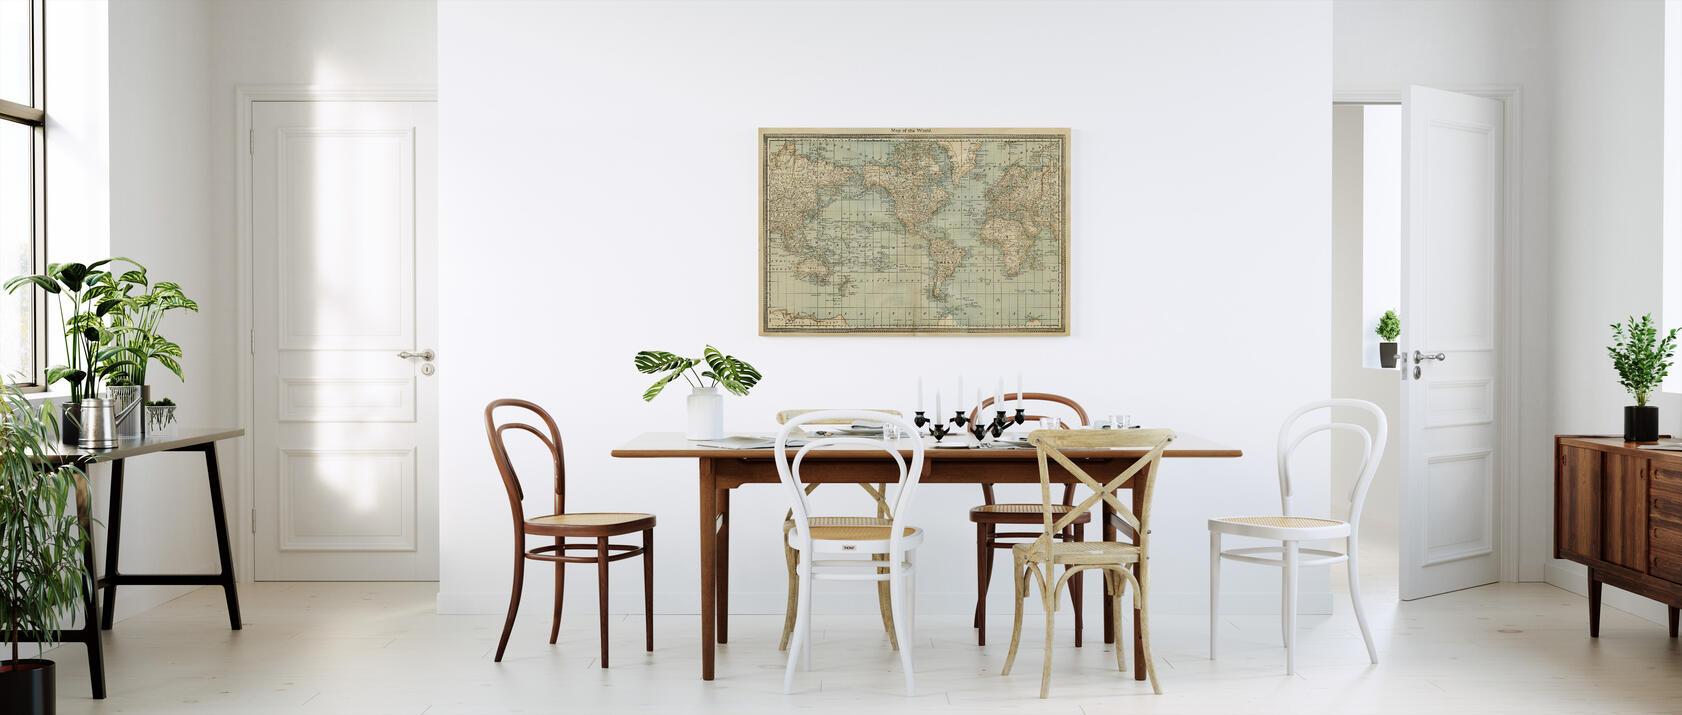 pale vintage world map designerbild auf baumwollgewebe. Black Bedroom Furniture Sets. Home Design Ideas